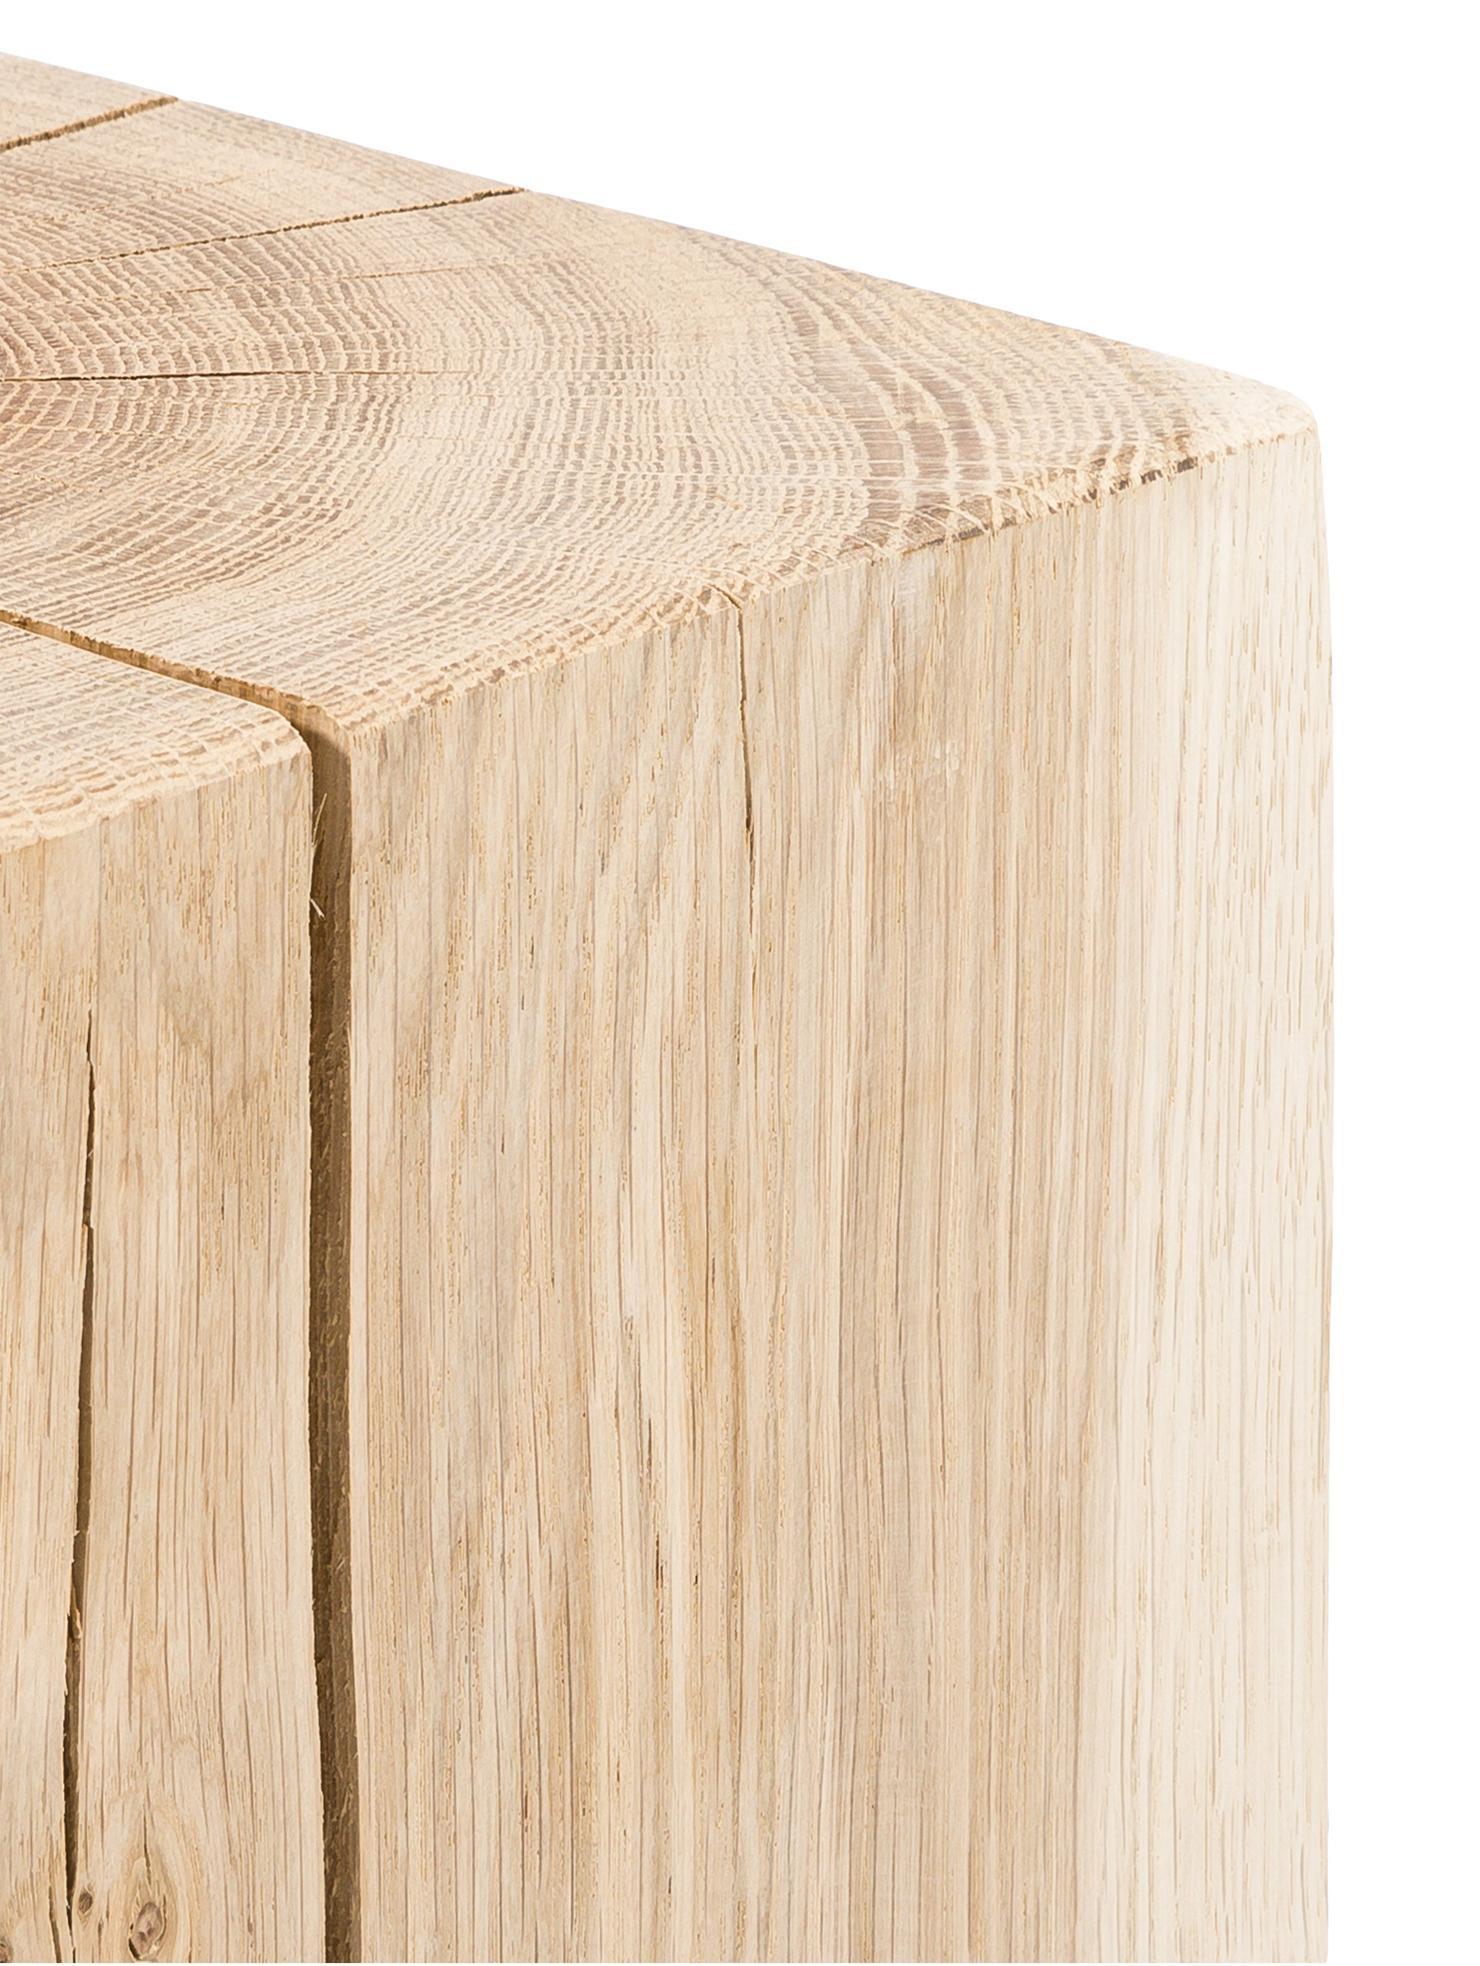 Tabouret en bois de chêne massif Block, Chêne